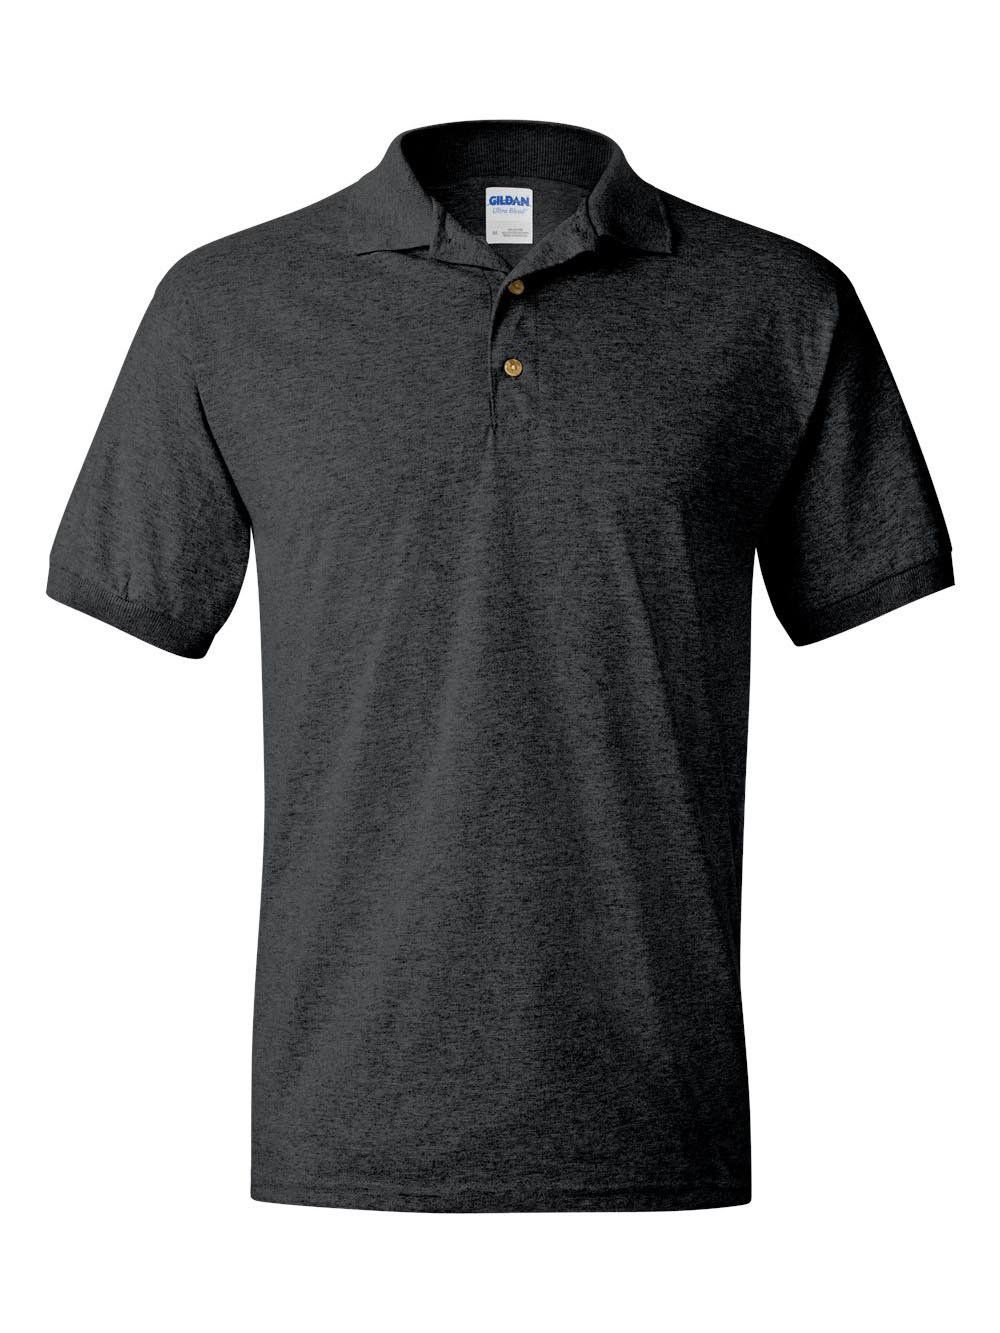 Gildan 8800 - Classic Fit Adult Jersey Sport Shirt DryBlend - First Quality - Dark Heather - 2X-Large